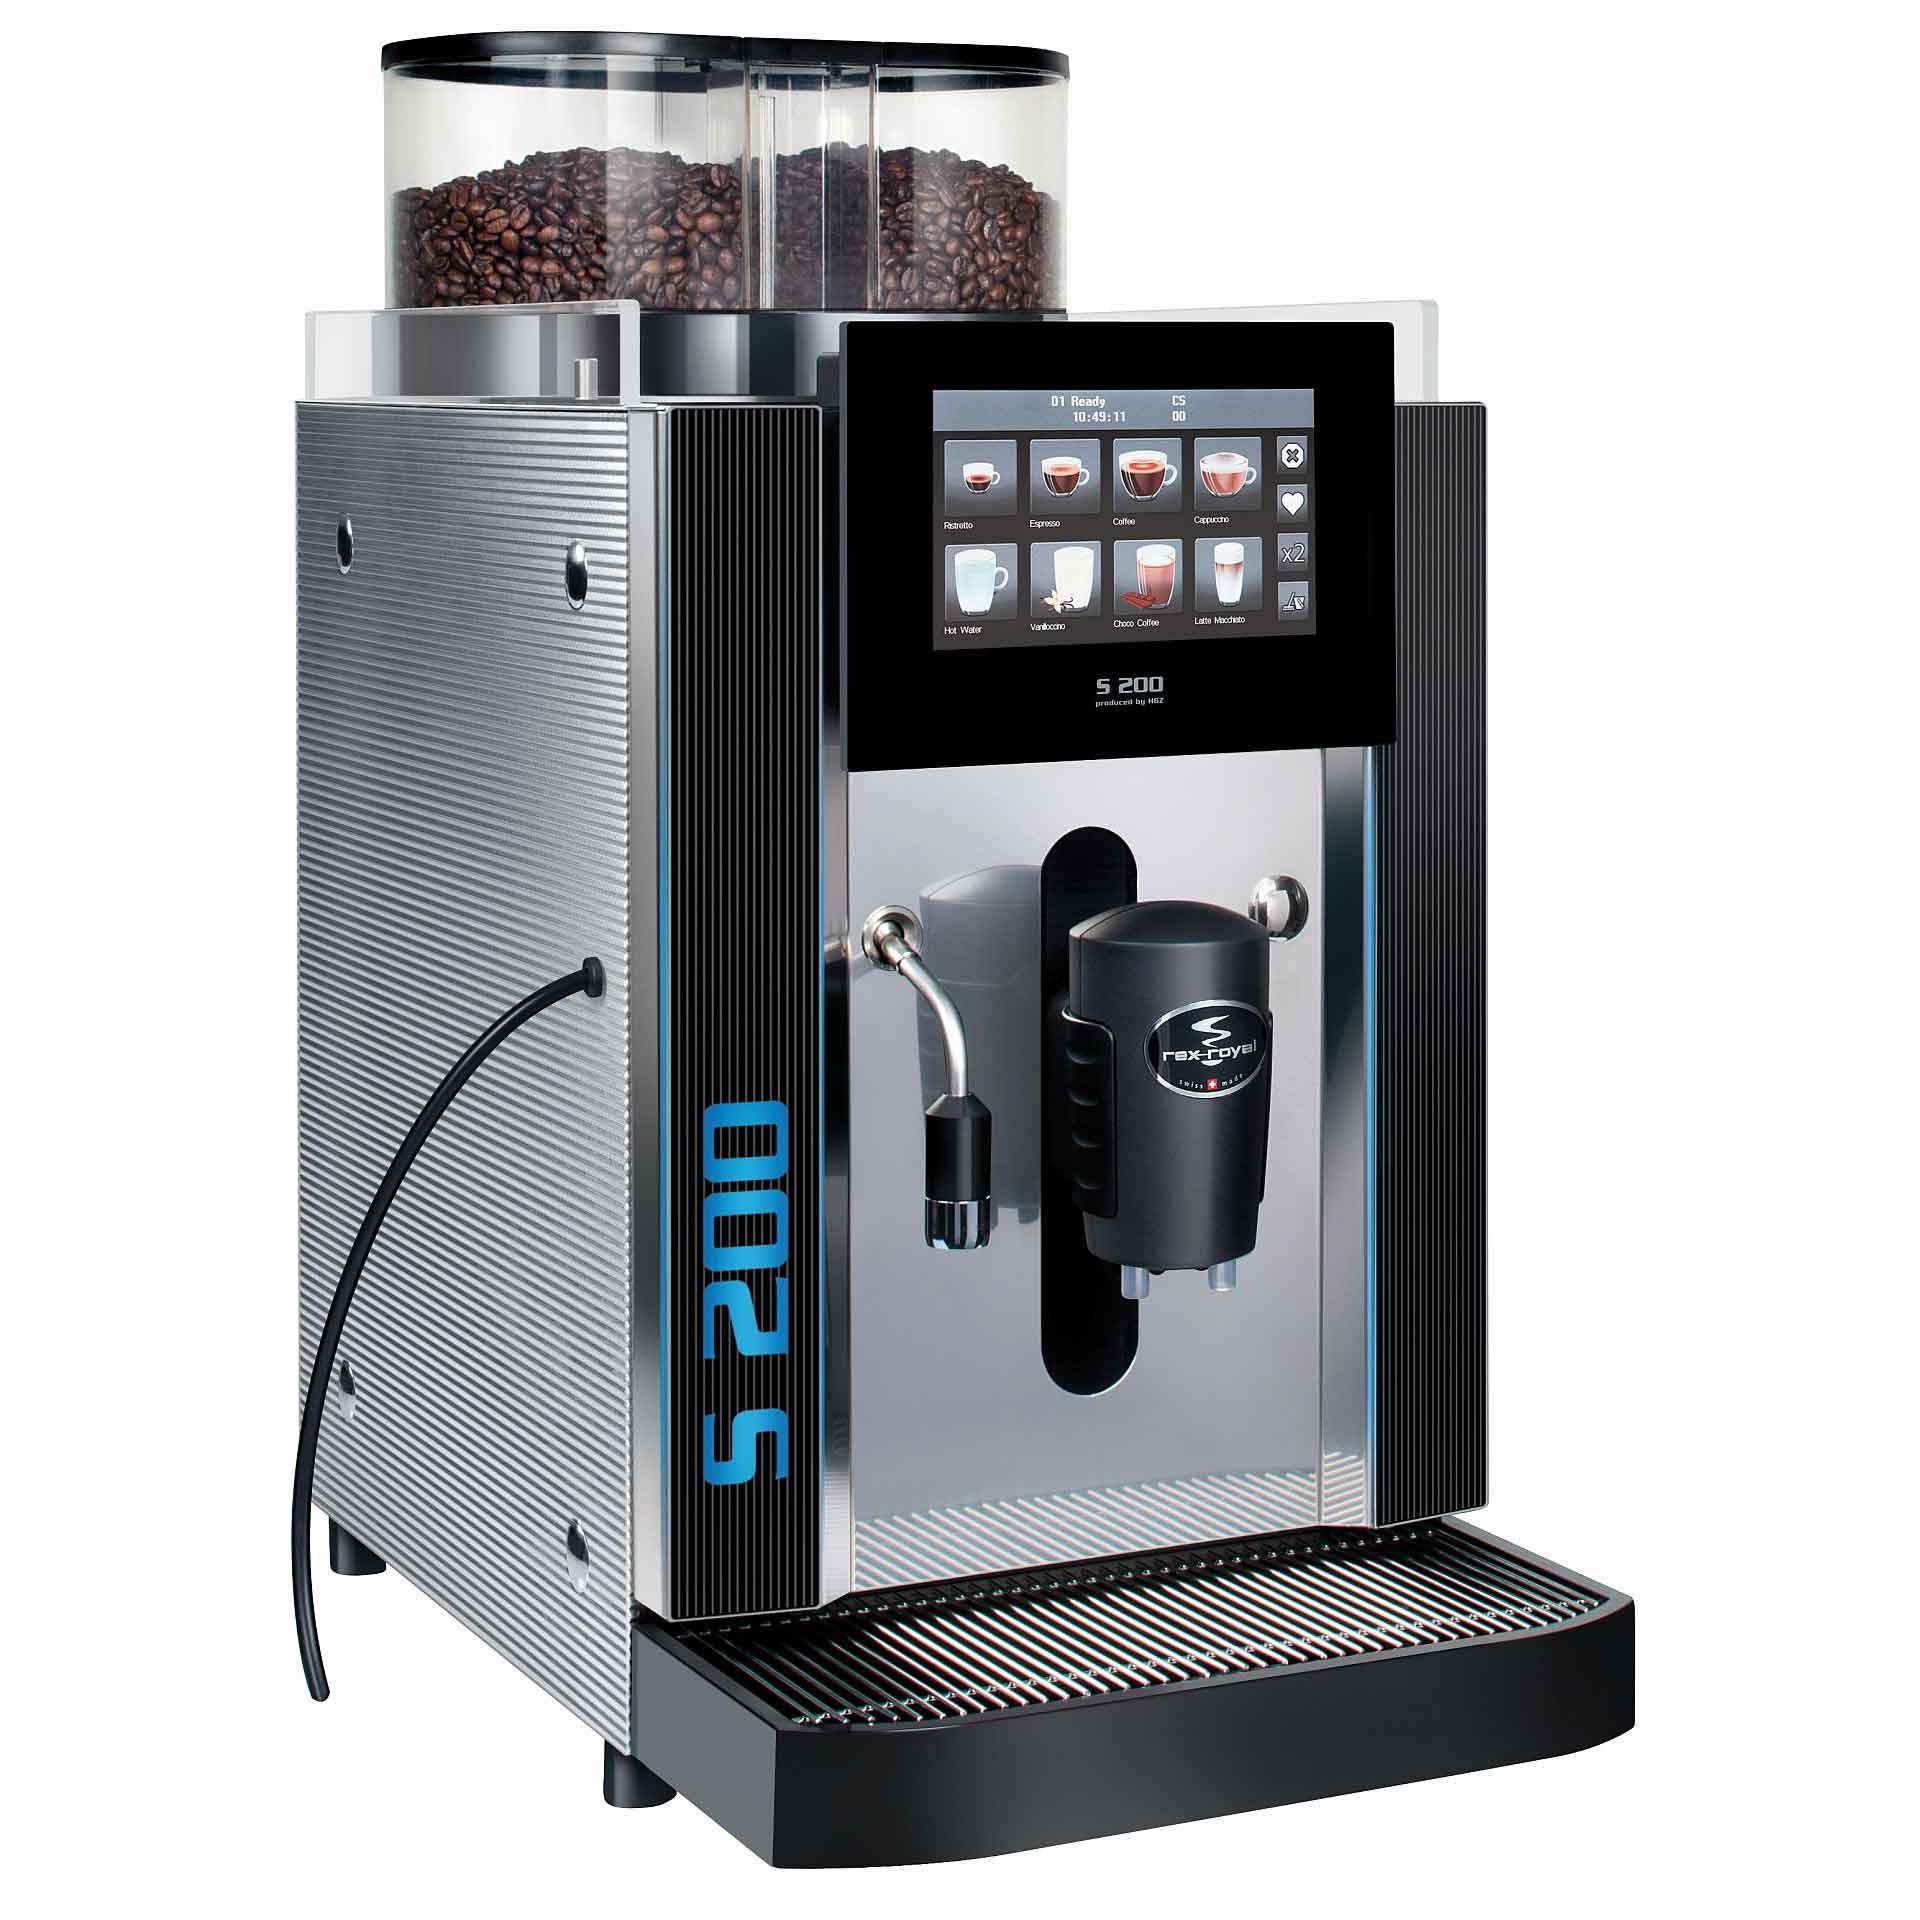 Rex Royal Kaffeevollautomat S200 MCT Seite